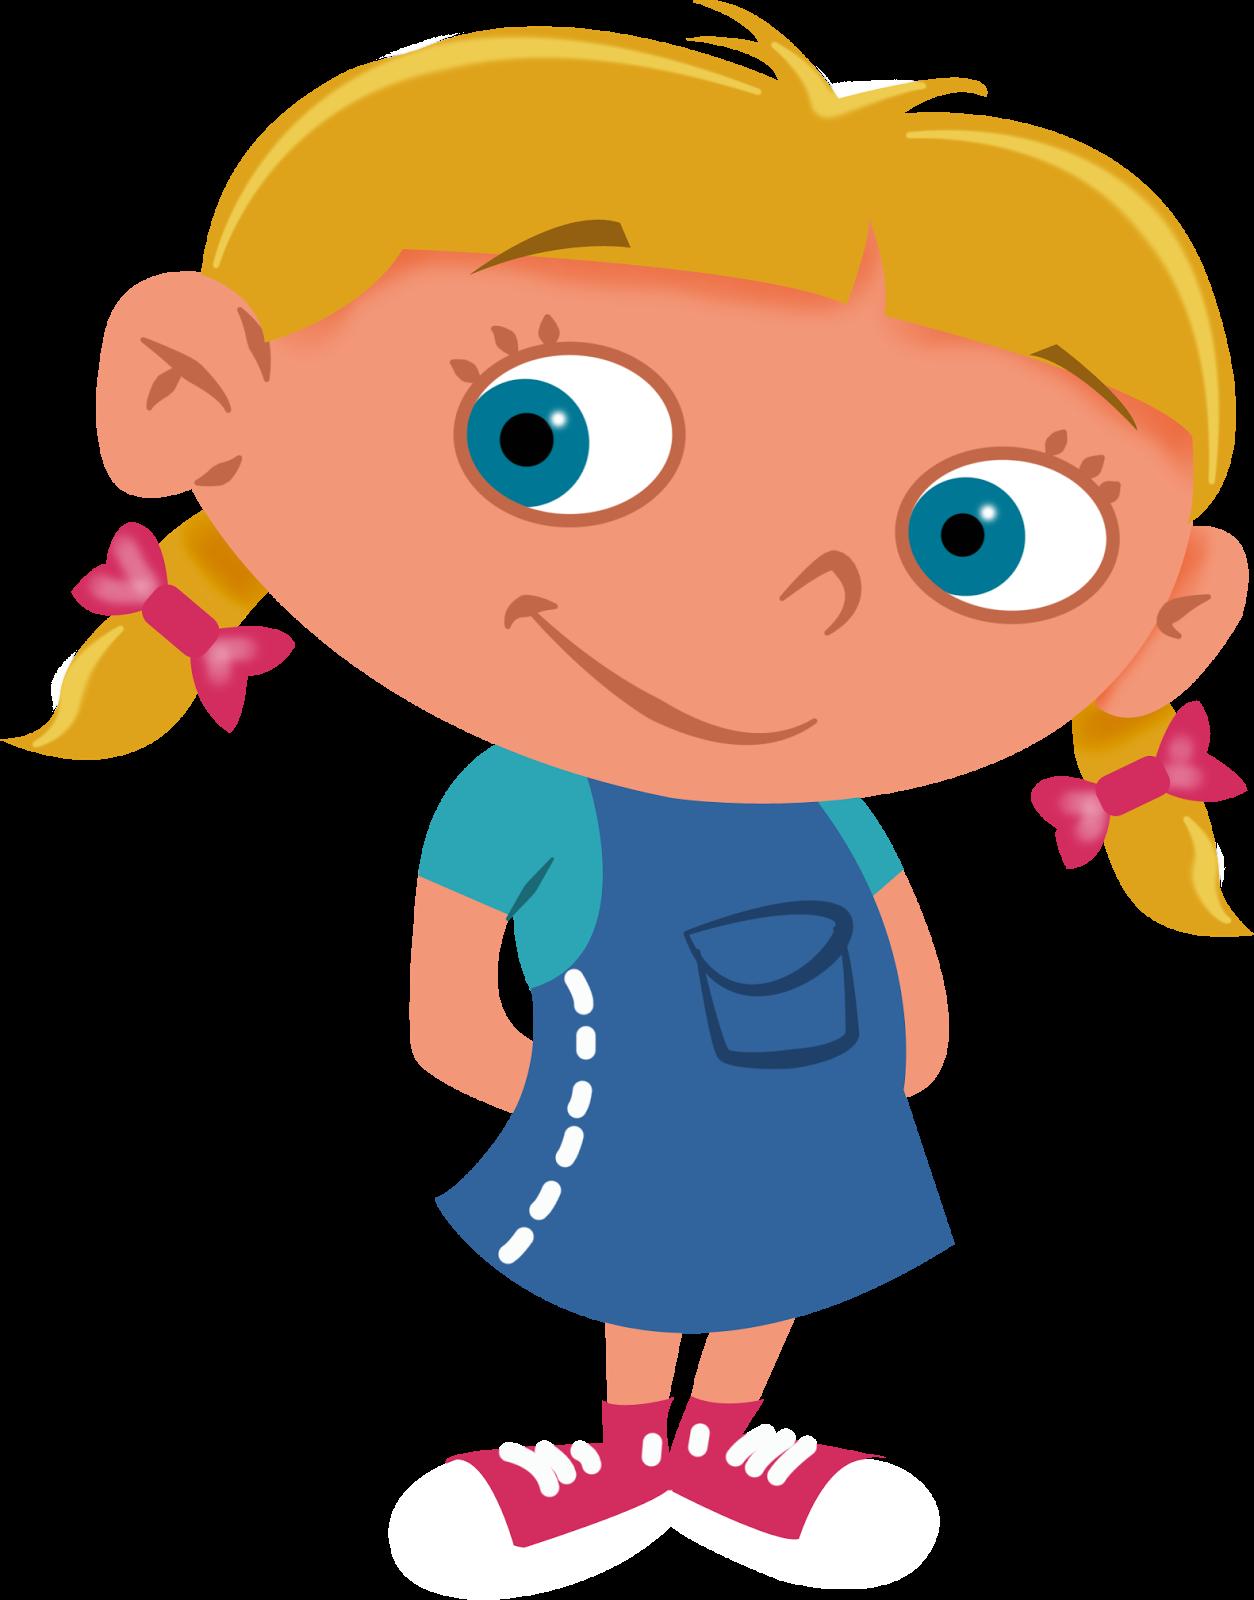 Cartoon Characters: Little Einsteins (PNG)